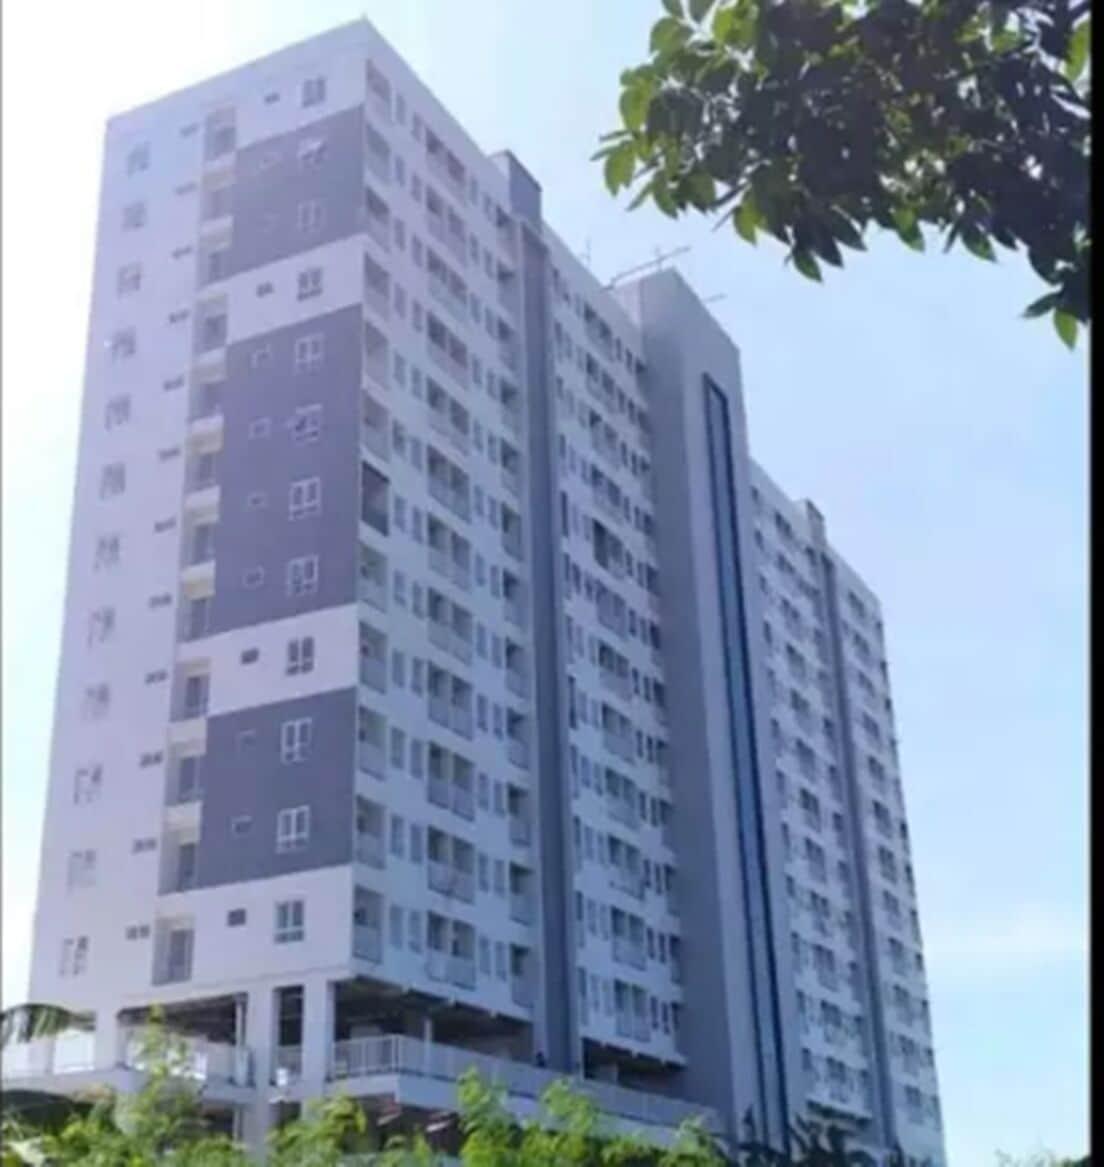 Fully Furnished Studio Poris 88 Apartment, Tangerang